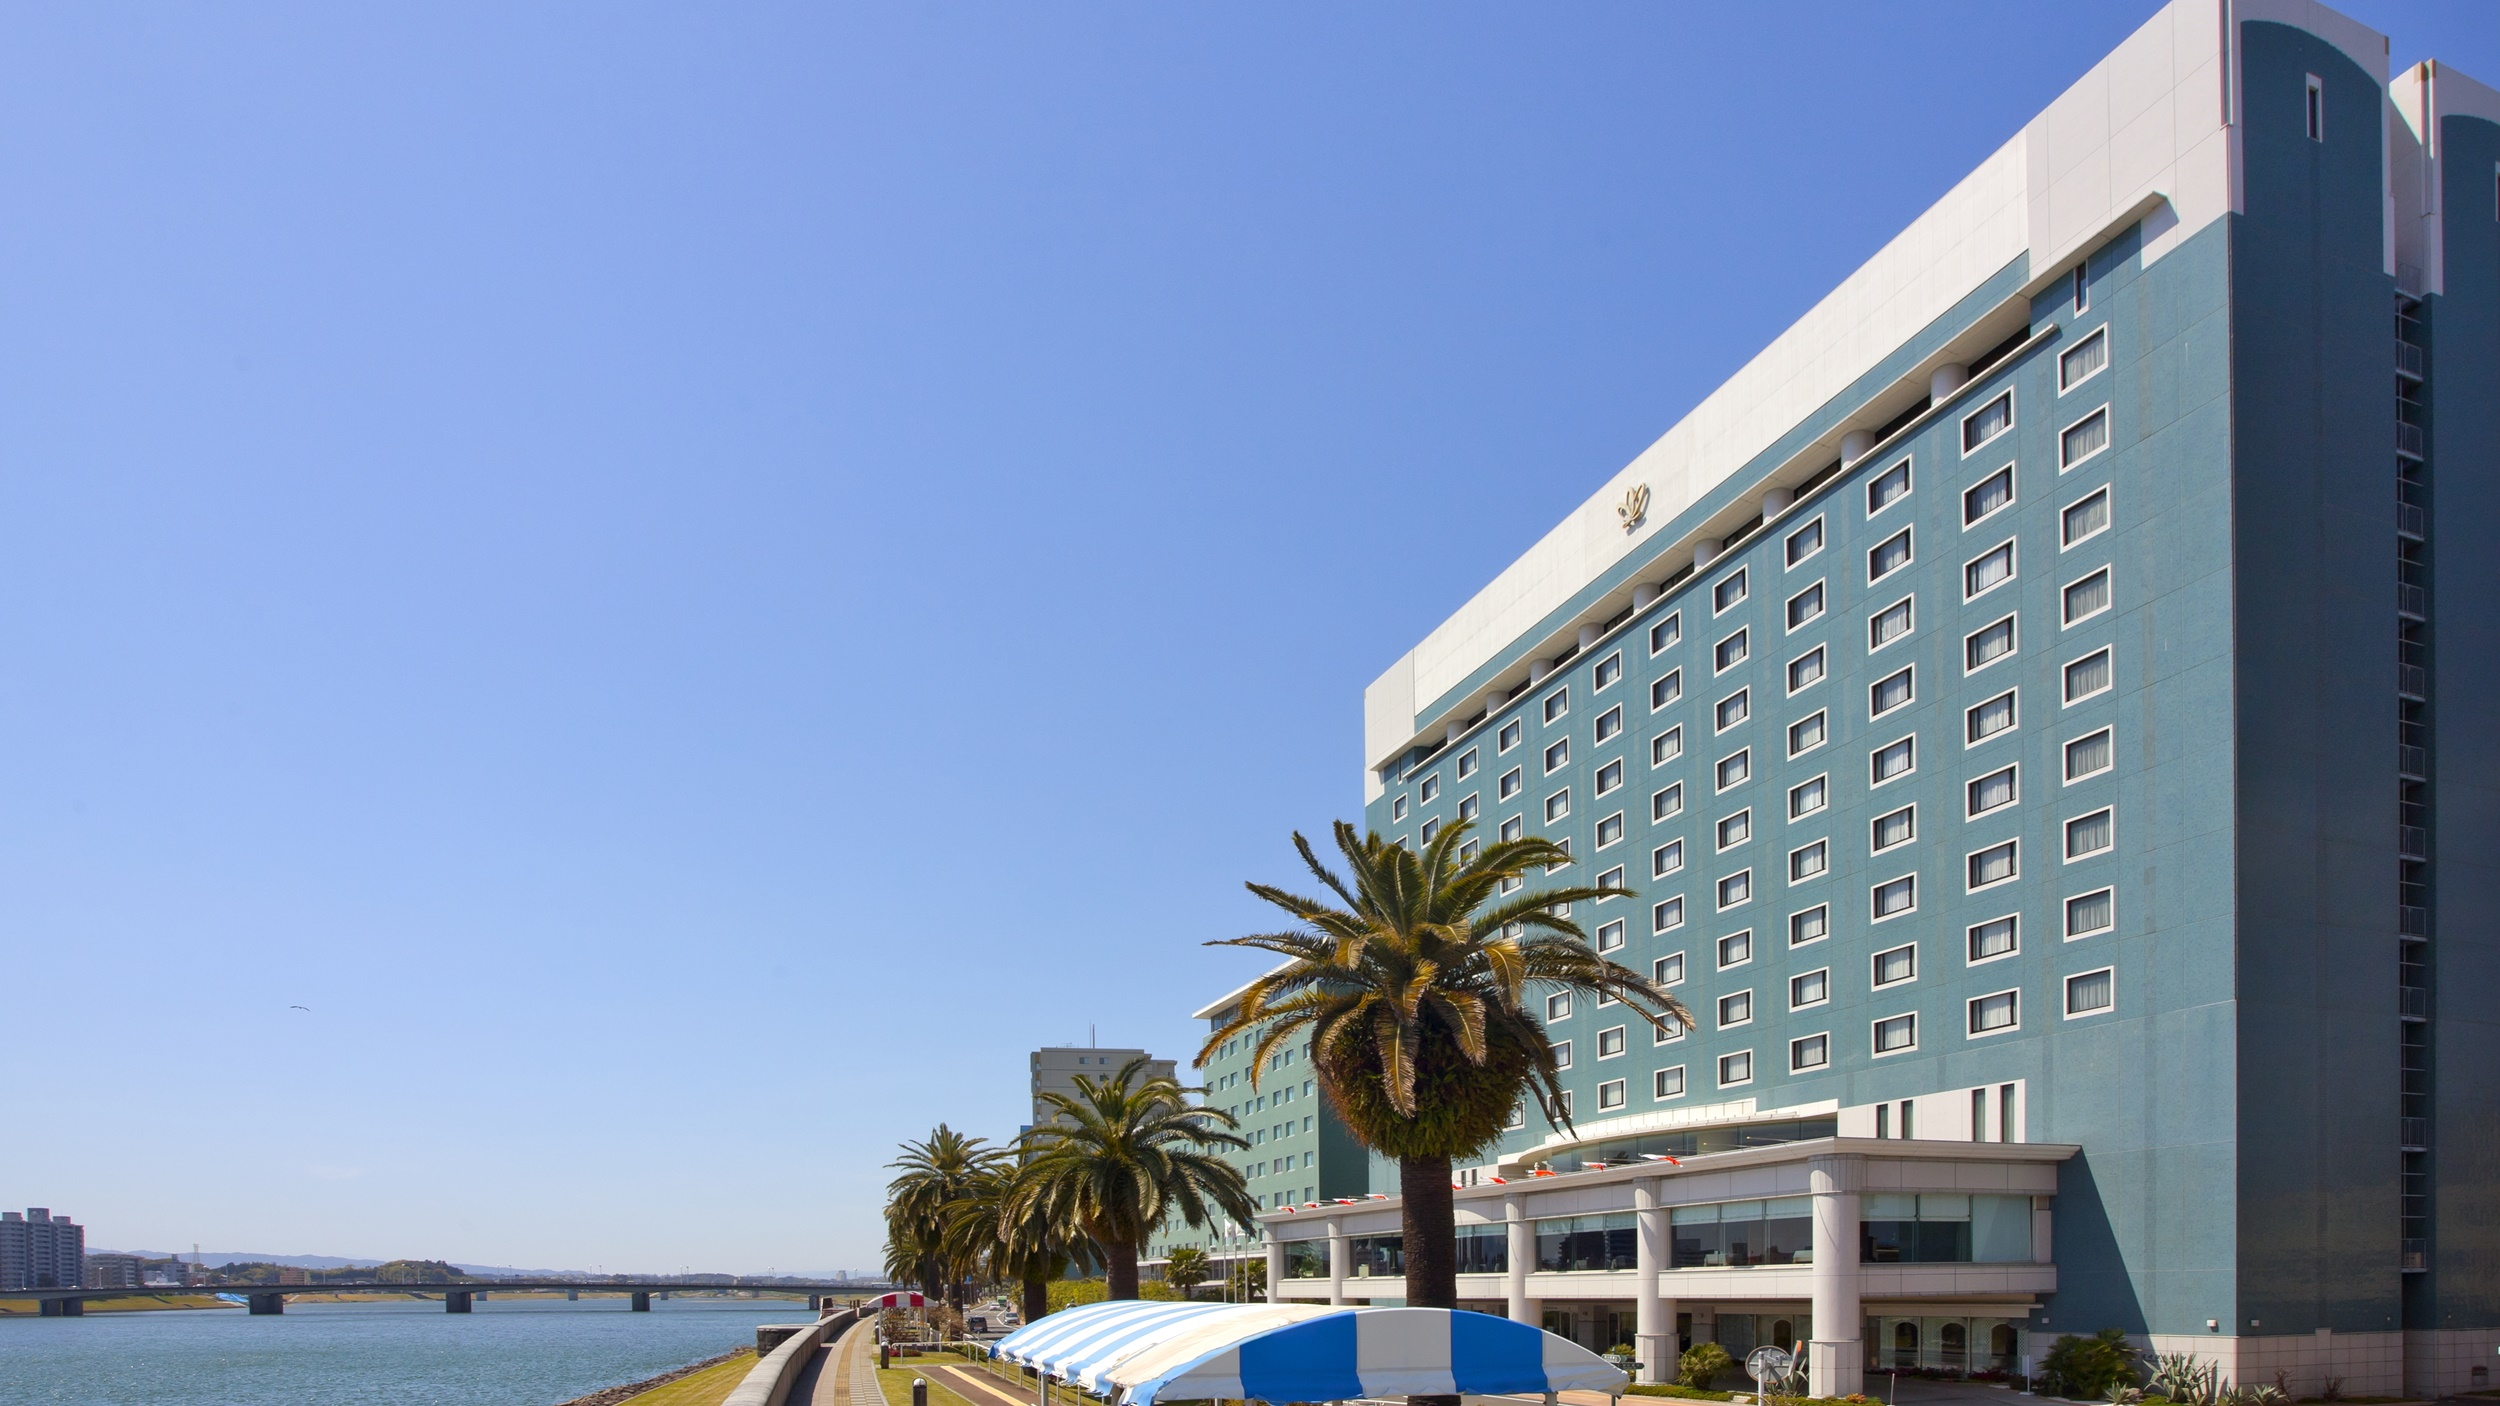 宮崎観光ホテル 空室検索へ